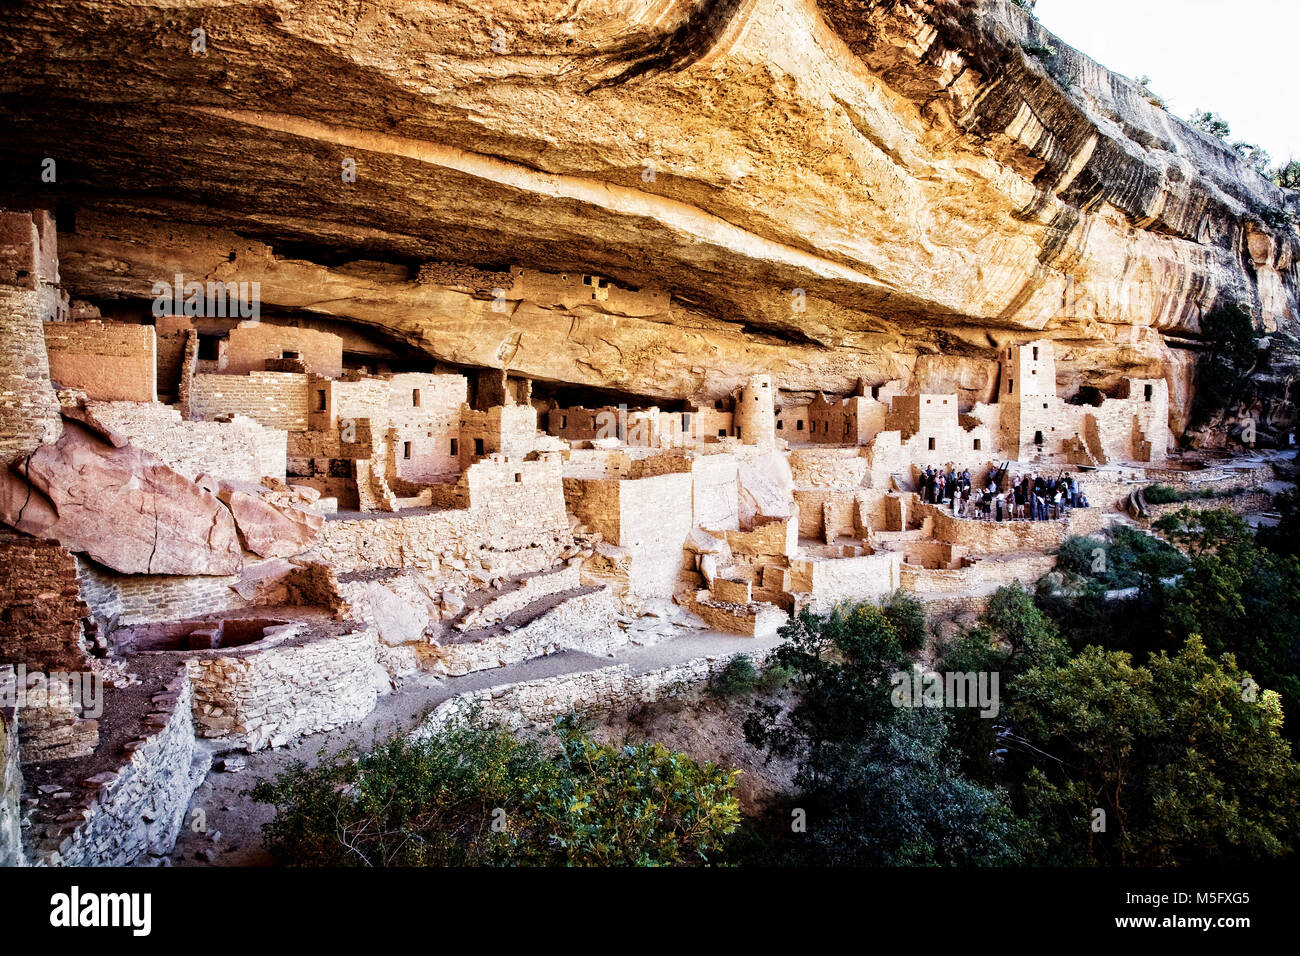 Visitors tour the Cliff Palace ruins at Mesa Verde National Park, Colorado. - Stock Image